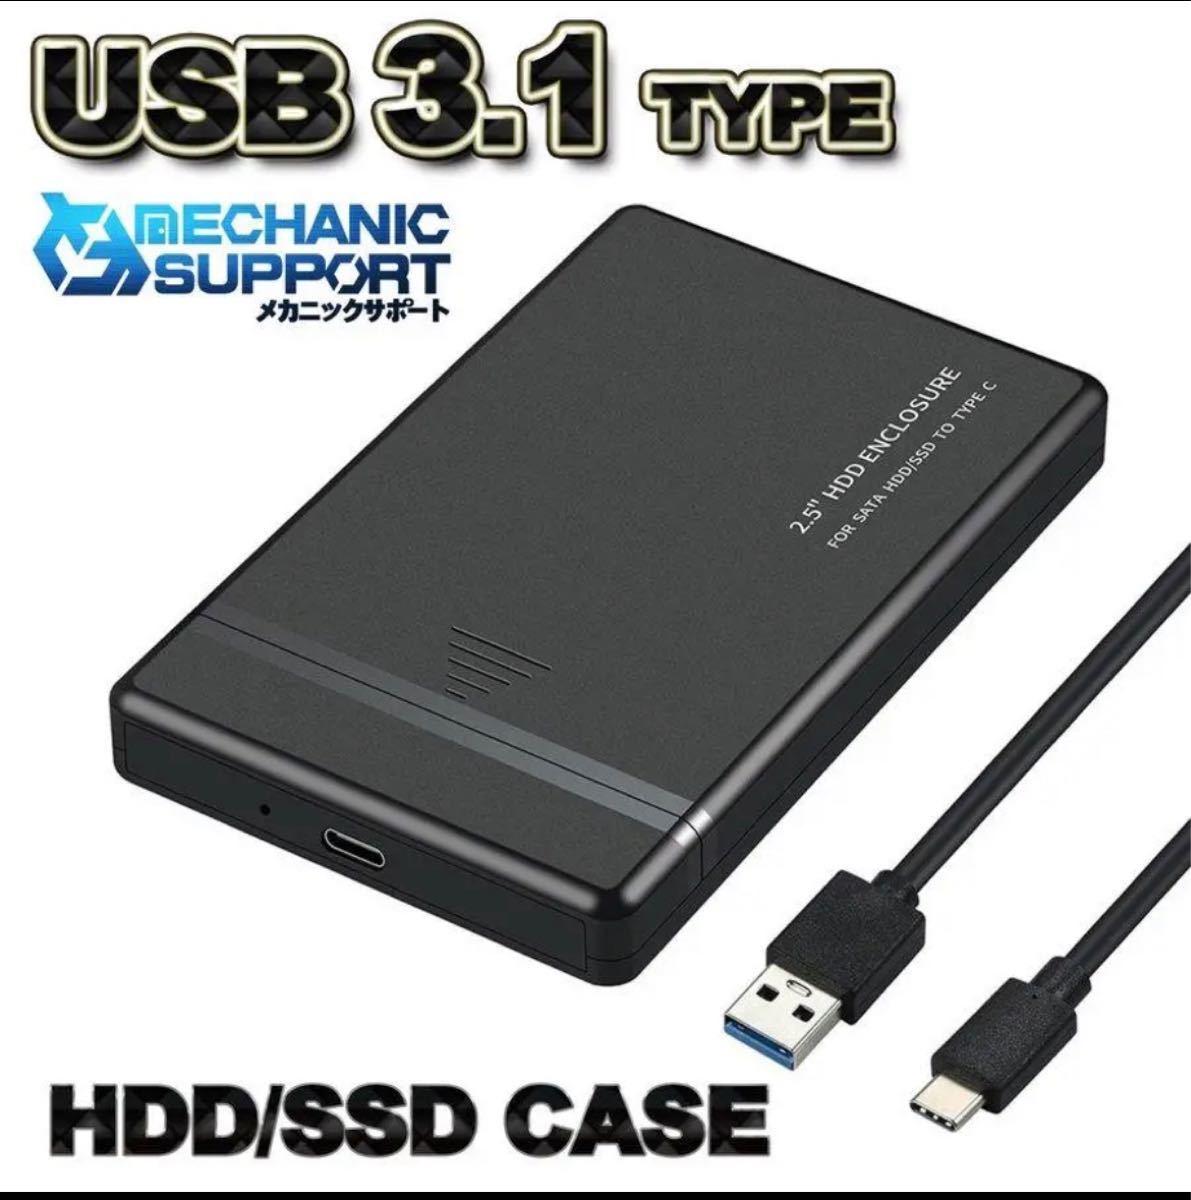 【USB 3.1 接続】 2.5インチ HDD/SSD/SATAディスクケース